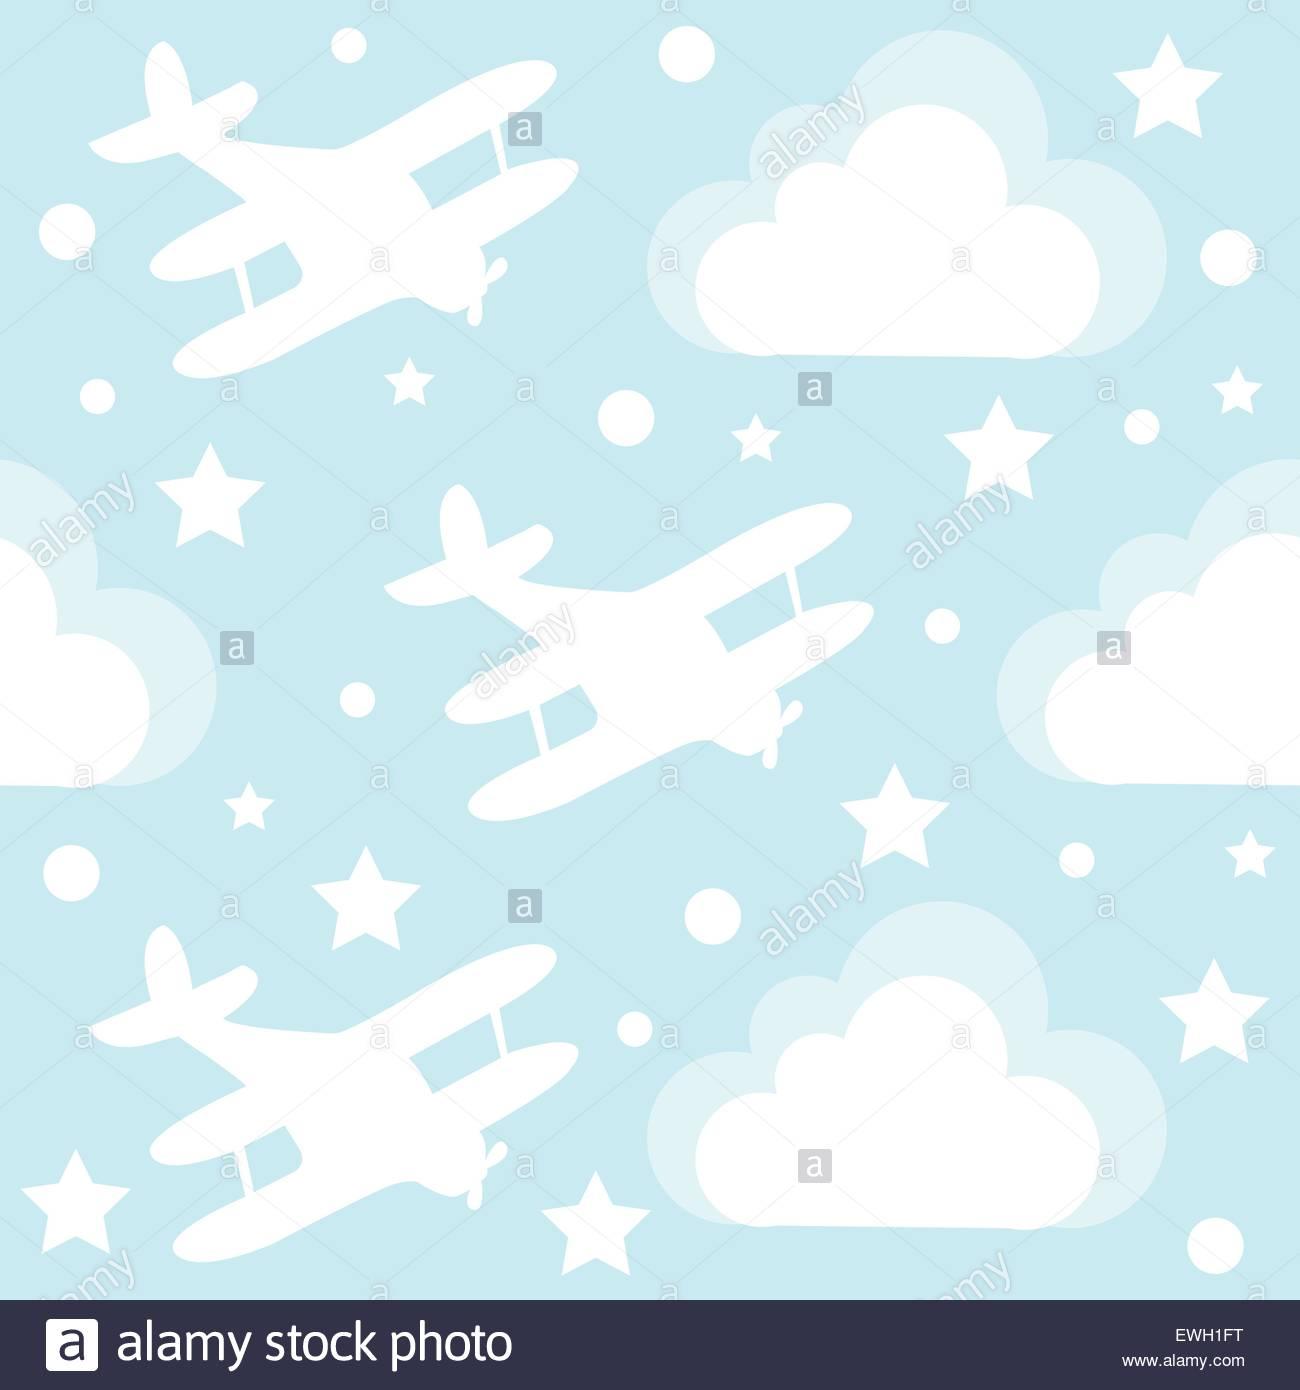 Baby boy seamless pattern con cartoon aeroplano giocattolo e nuvole